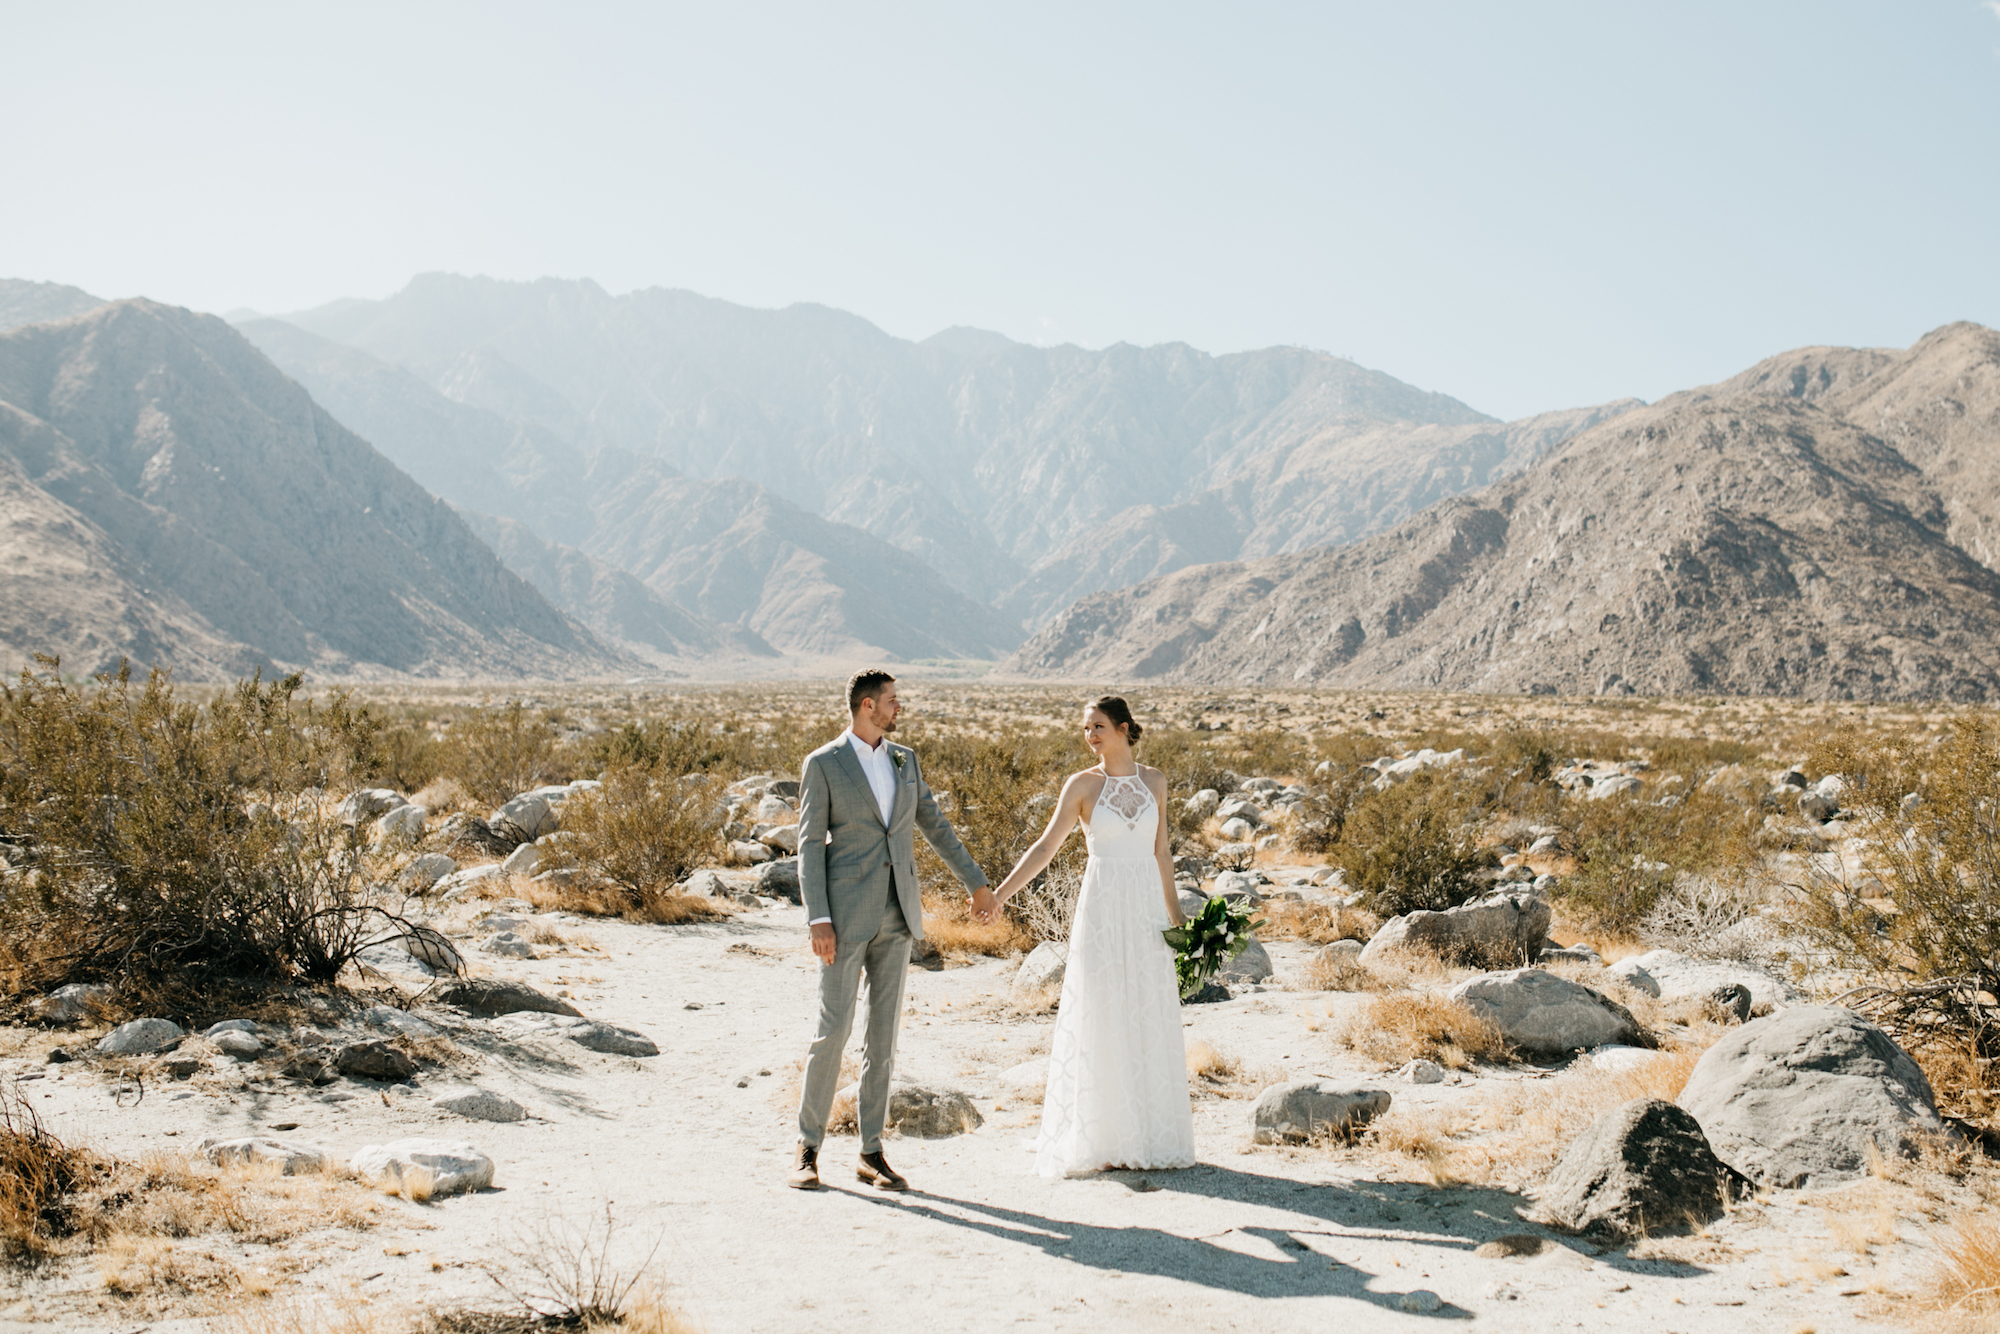 ace-hotel-palm-springs-wedding-photographer219.jpg